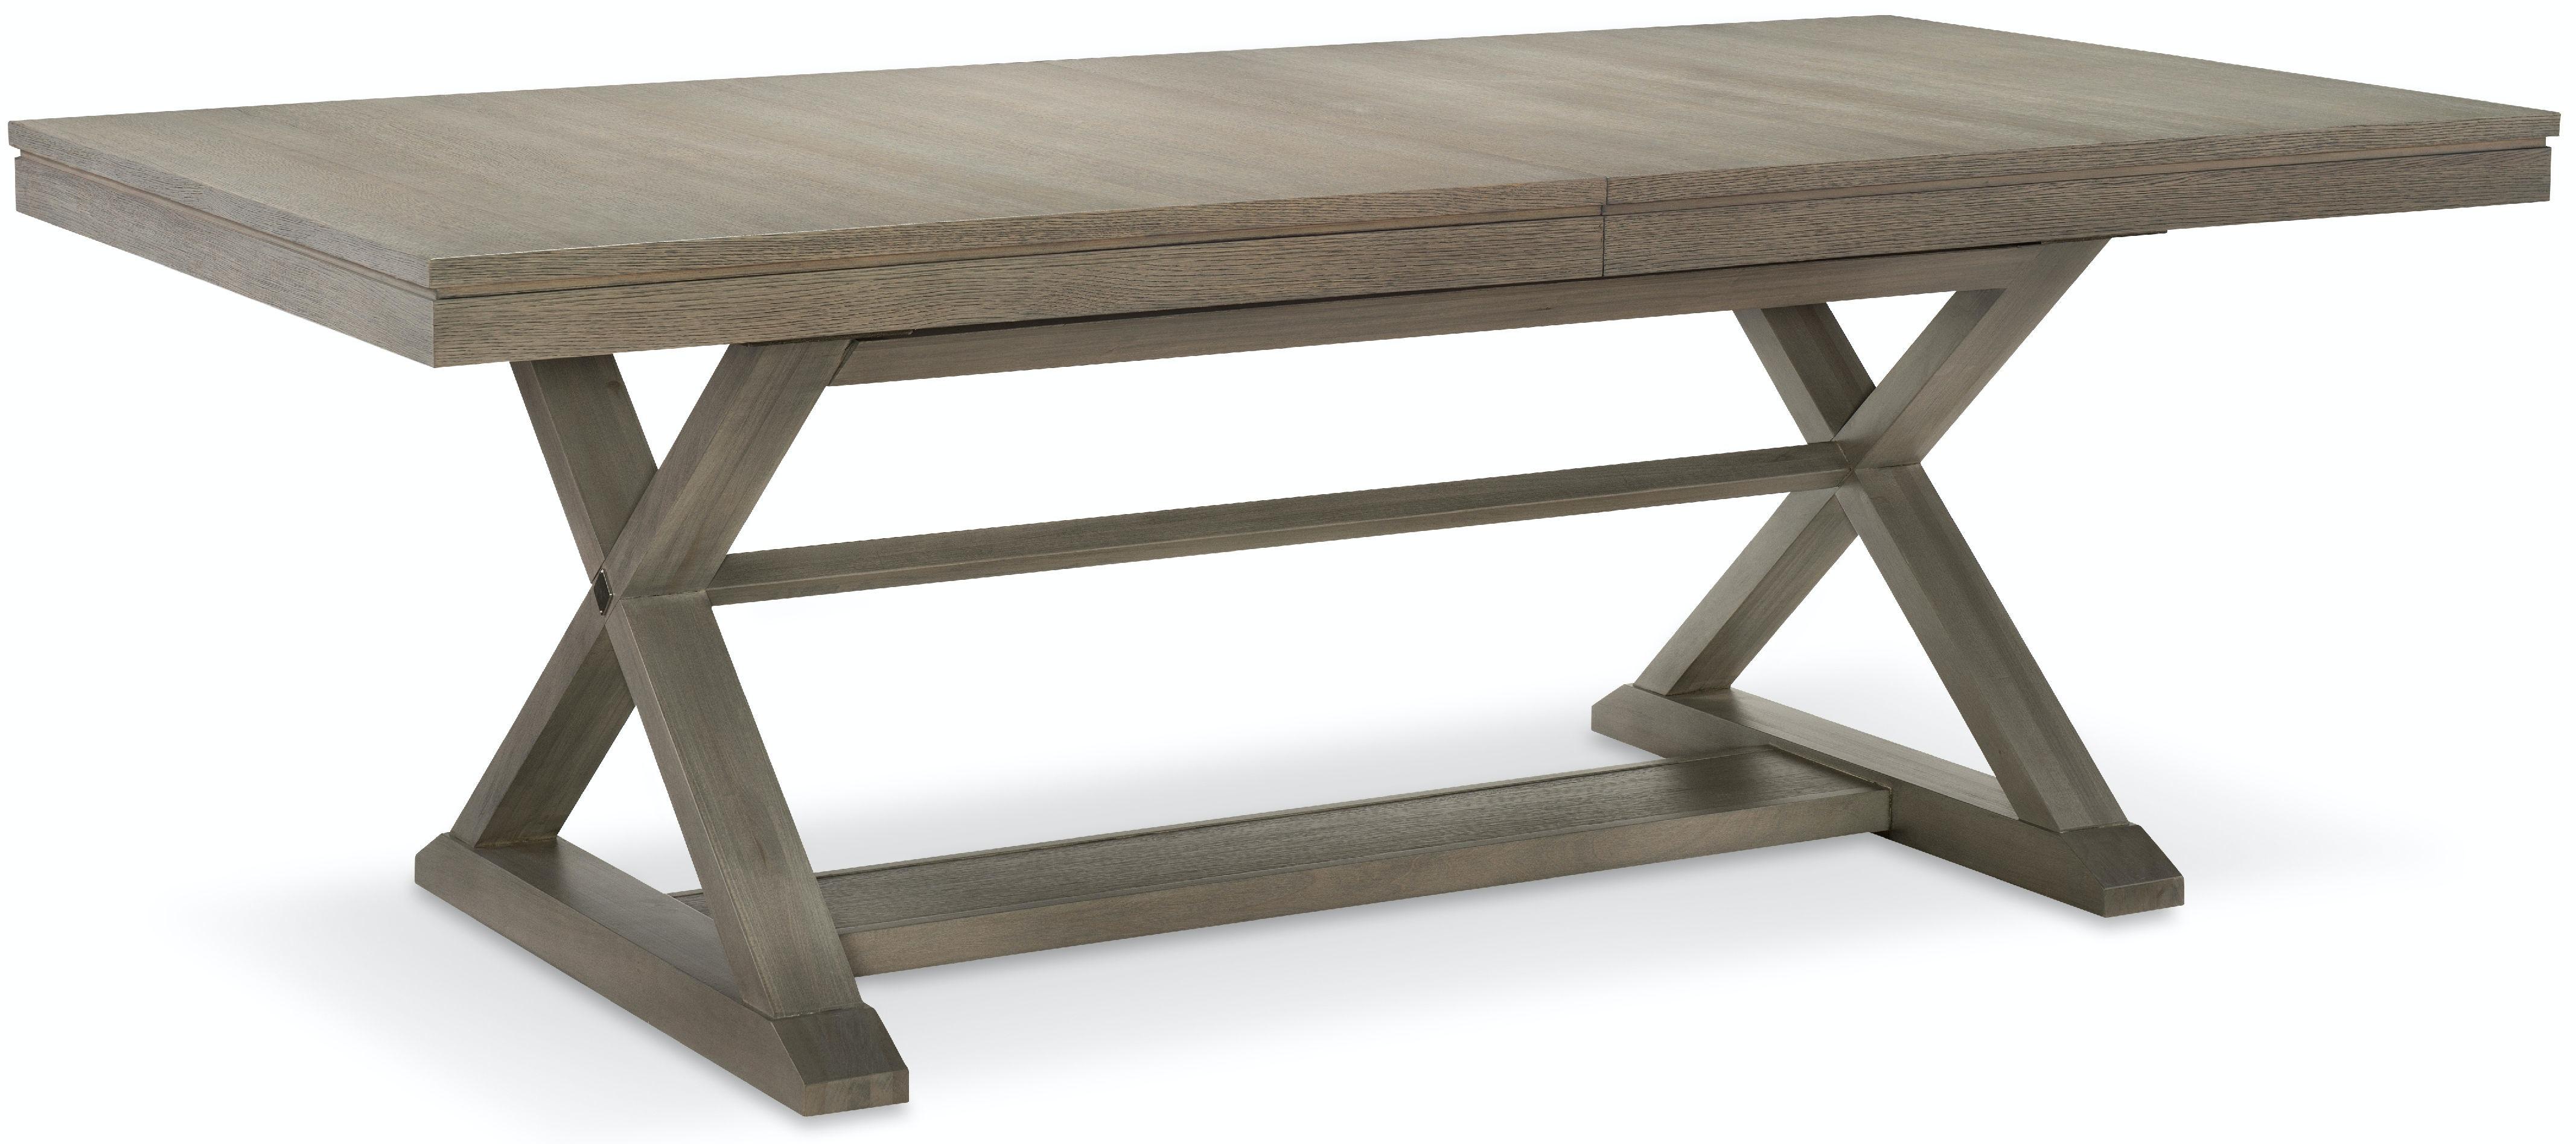 dining room rachael ray home - highline trestle table